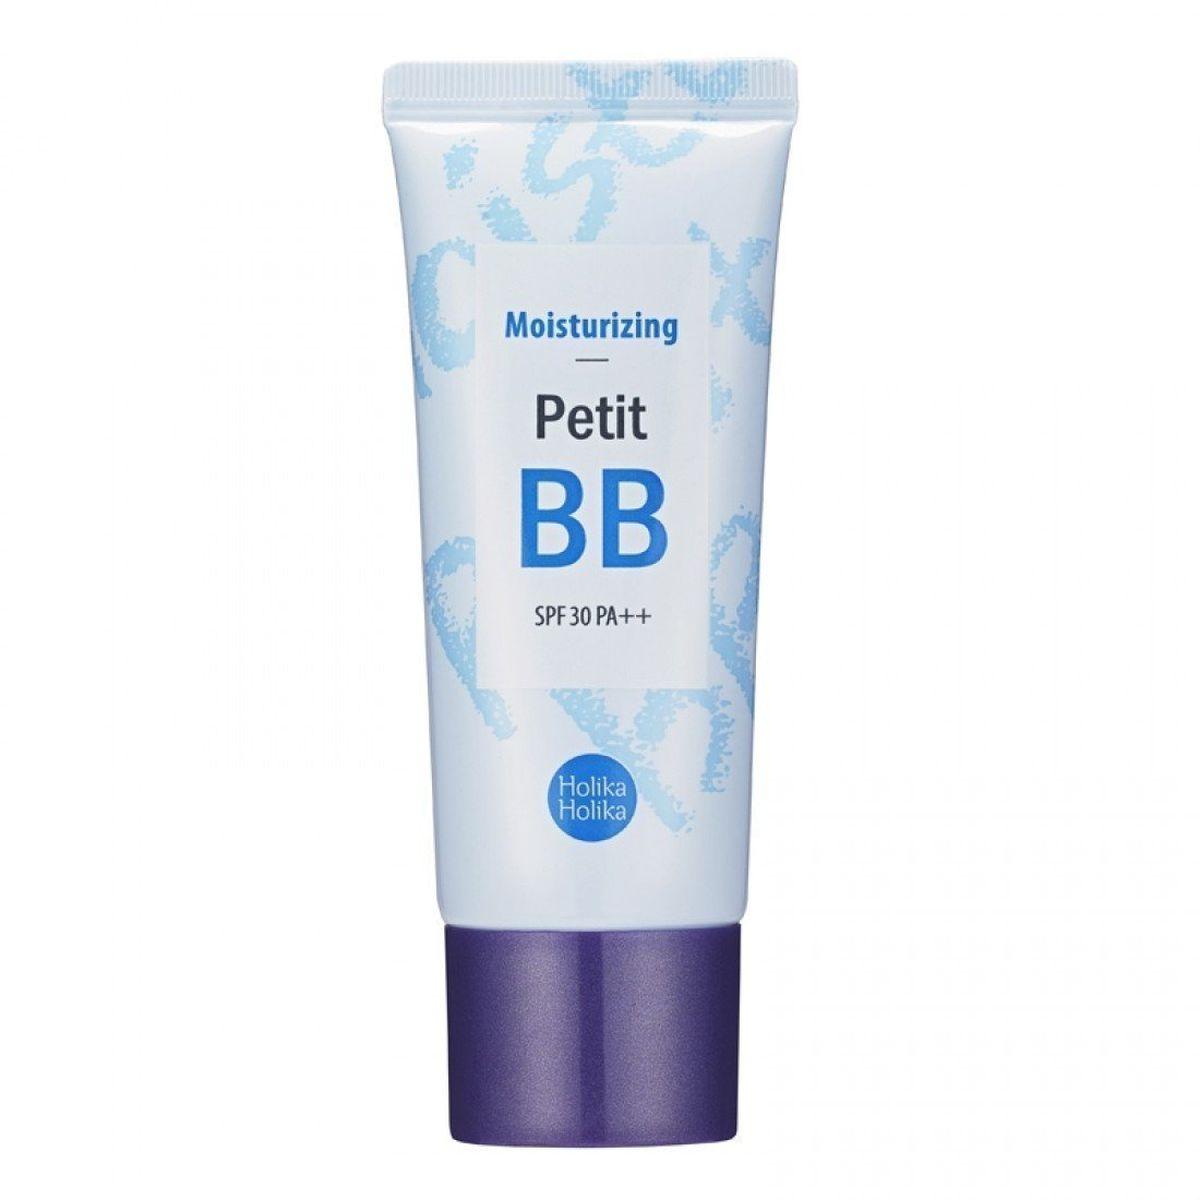 Увлажняющий ББ крем HOLIKA HOLIKA Petit Moisturizing BB Cream SPF30 PA++ - 30 мл